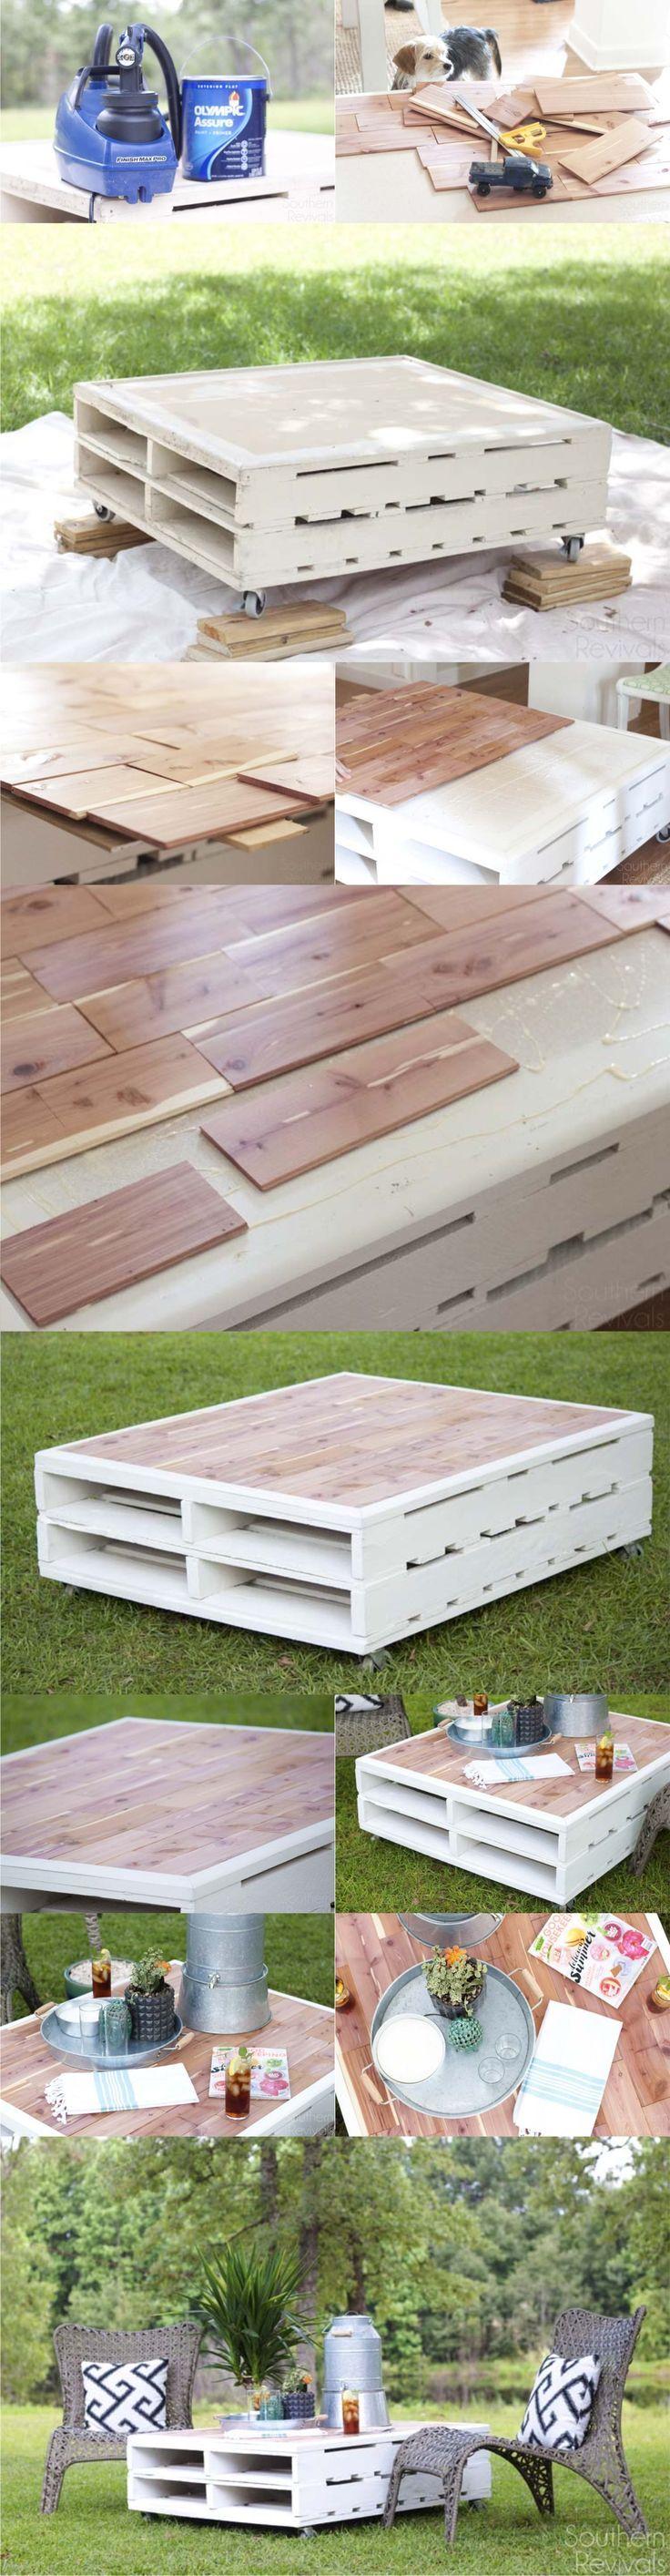 DIY tabela de paletes acabamento laminado engenhoso 2: